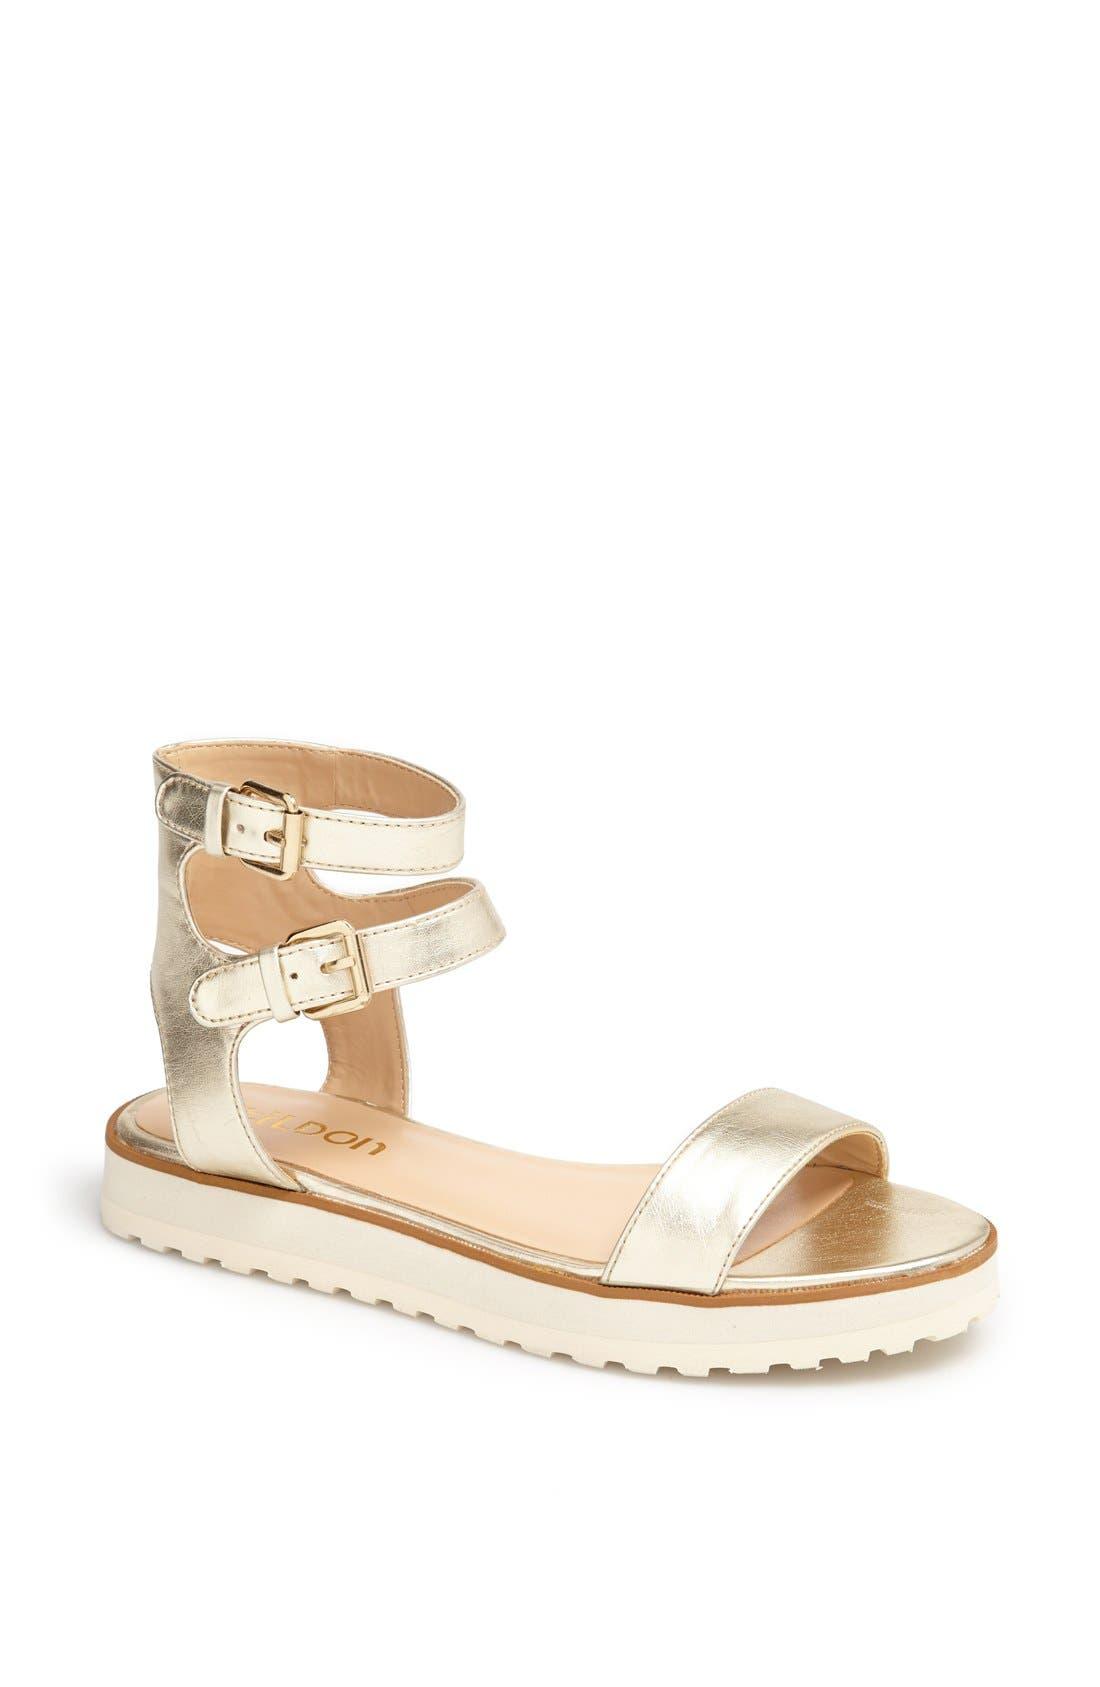 Main Image - Tildon 'Manda' Platform Ankle Strap Sandal